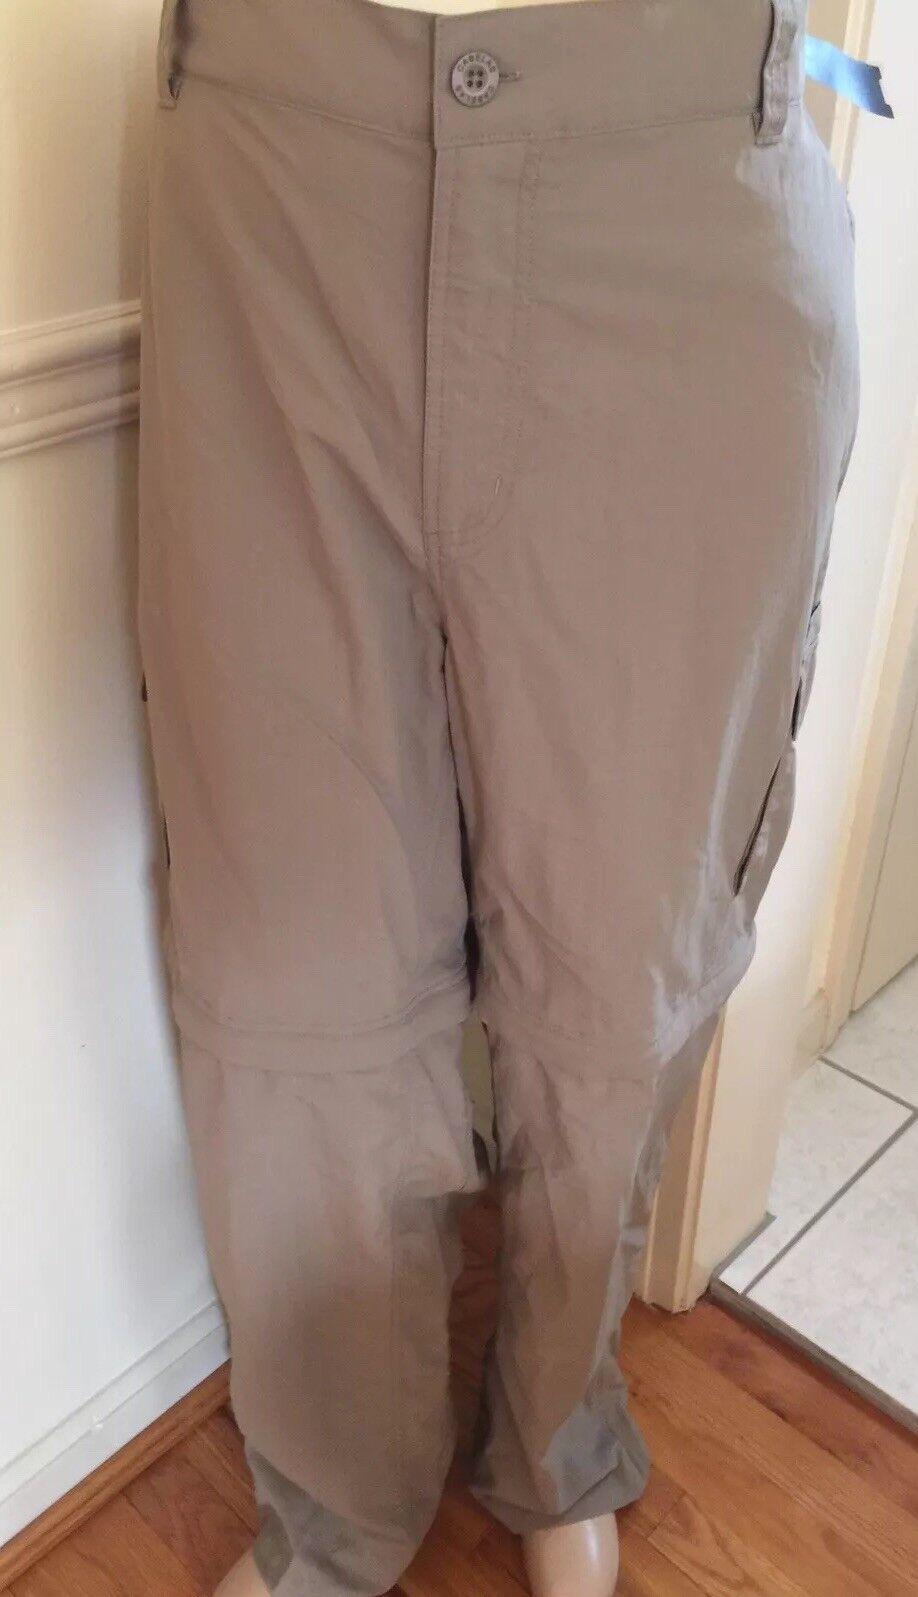 NWT Tan Desert Cabela's Congreenible Zip Off Pant Shorts Nylon Cargo 2XL X34